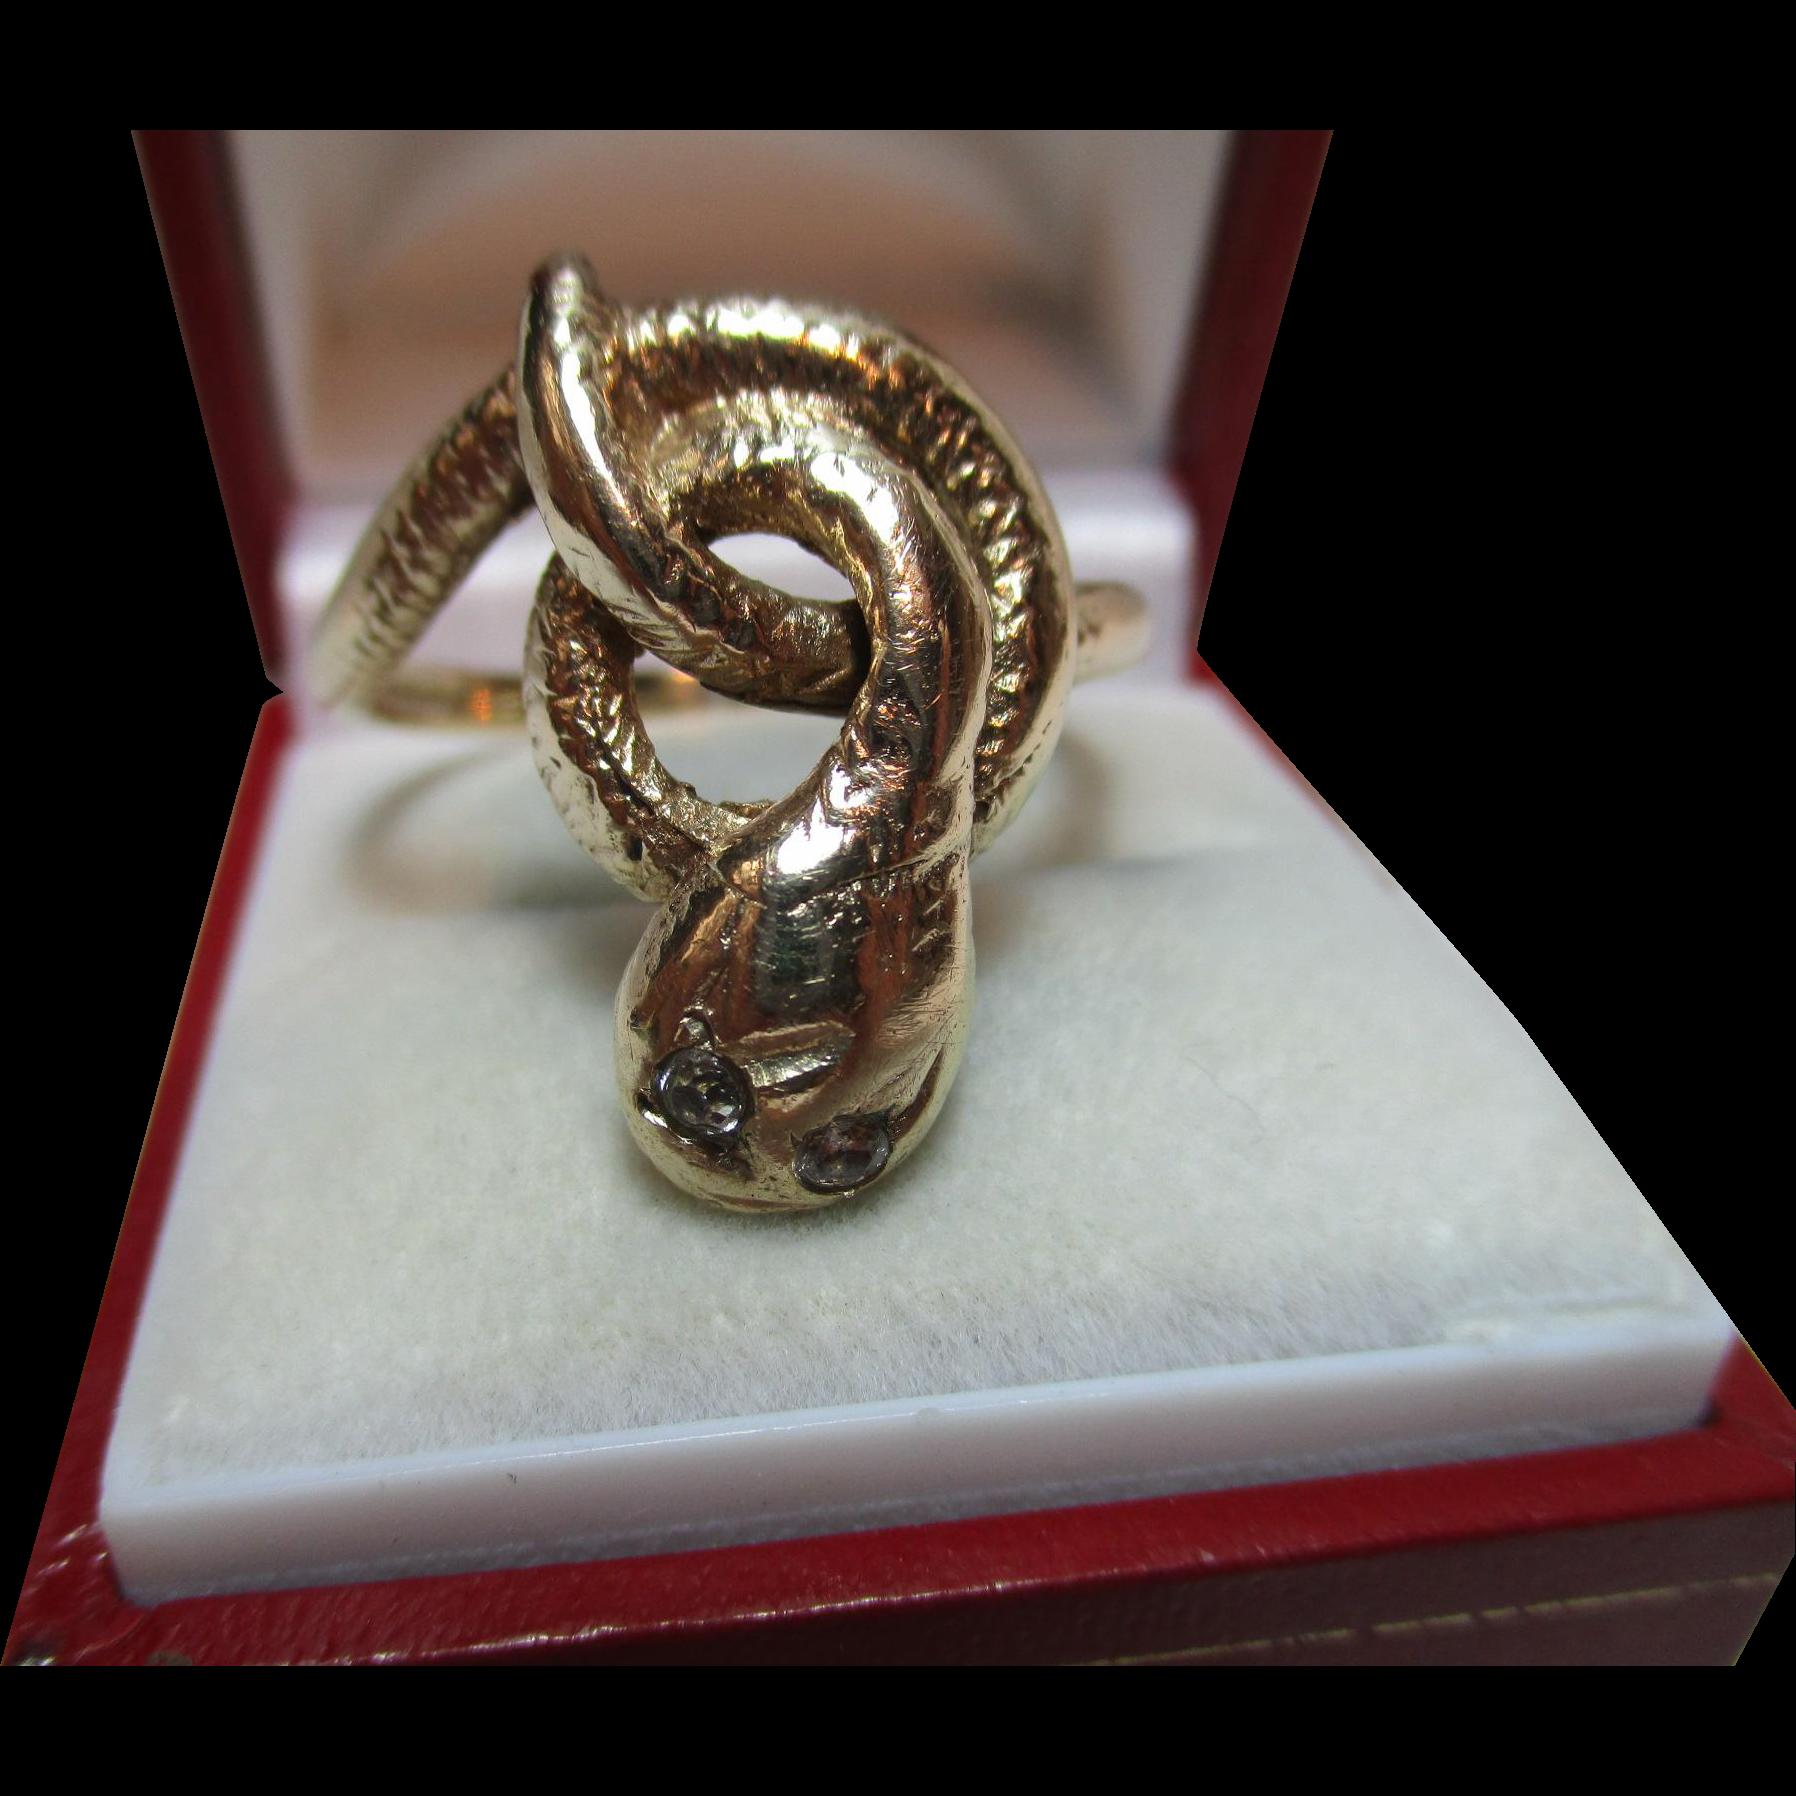 Large Vintage{Birmingham 1975} 9ct Solid Gold 'Snake' Ring With Diamond Gemstone Eyes{9.1 Grams}